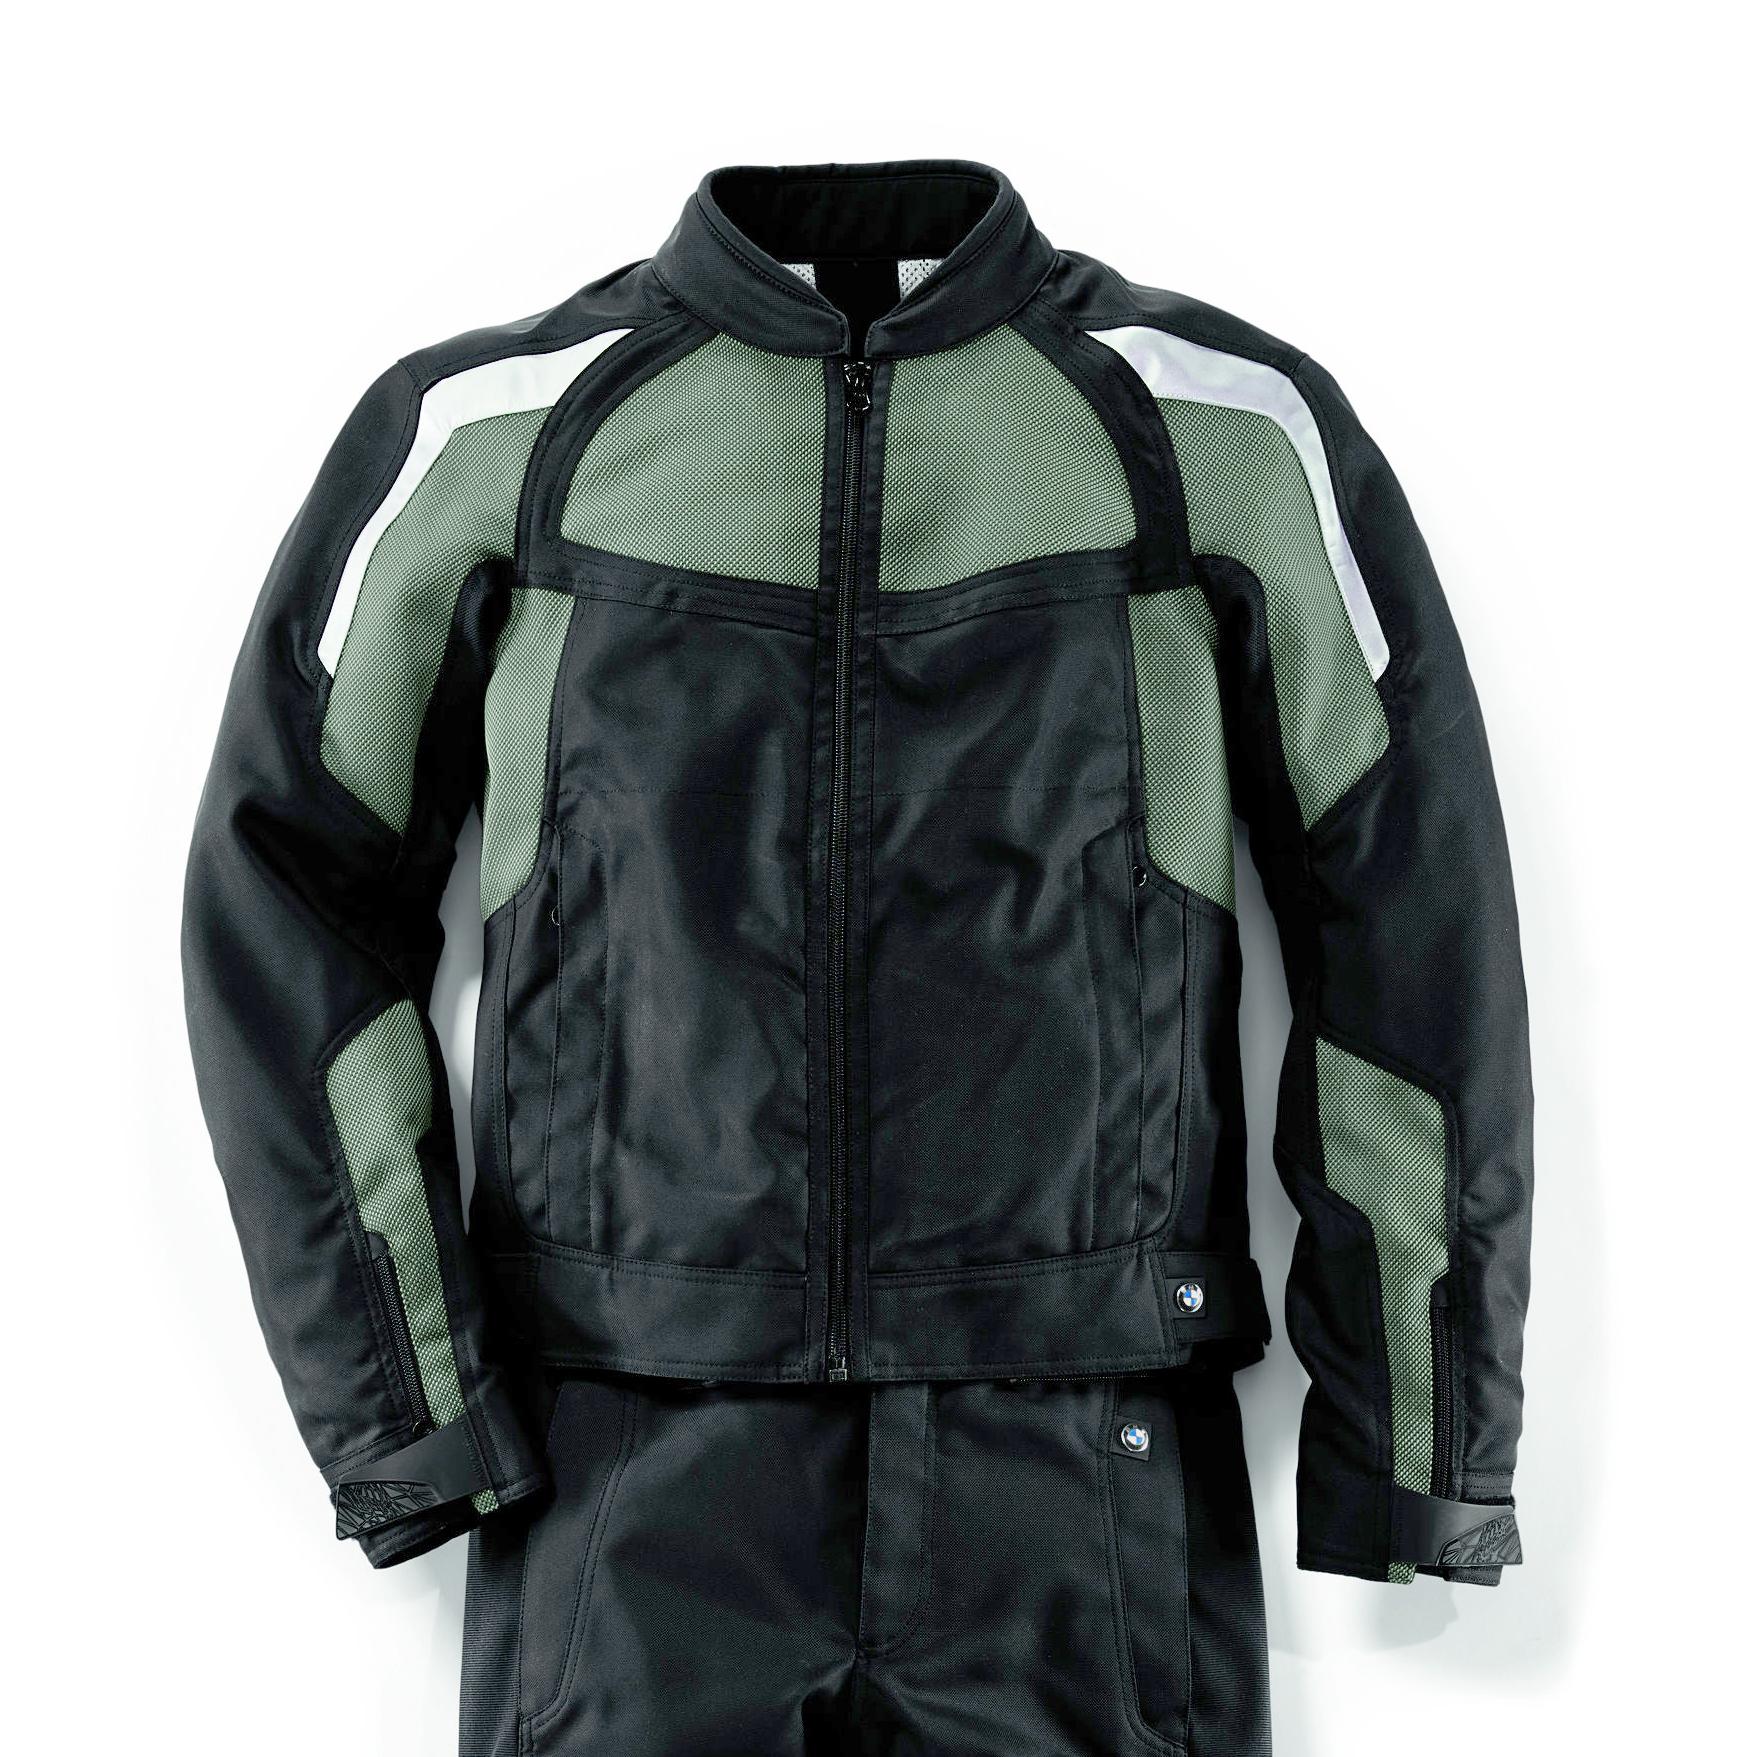 Bmw Men S Airflow Jacket Black 76118546896 Apparel